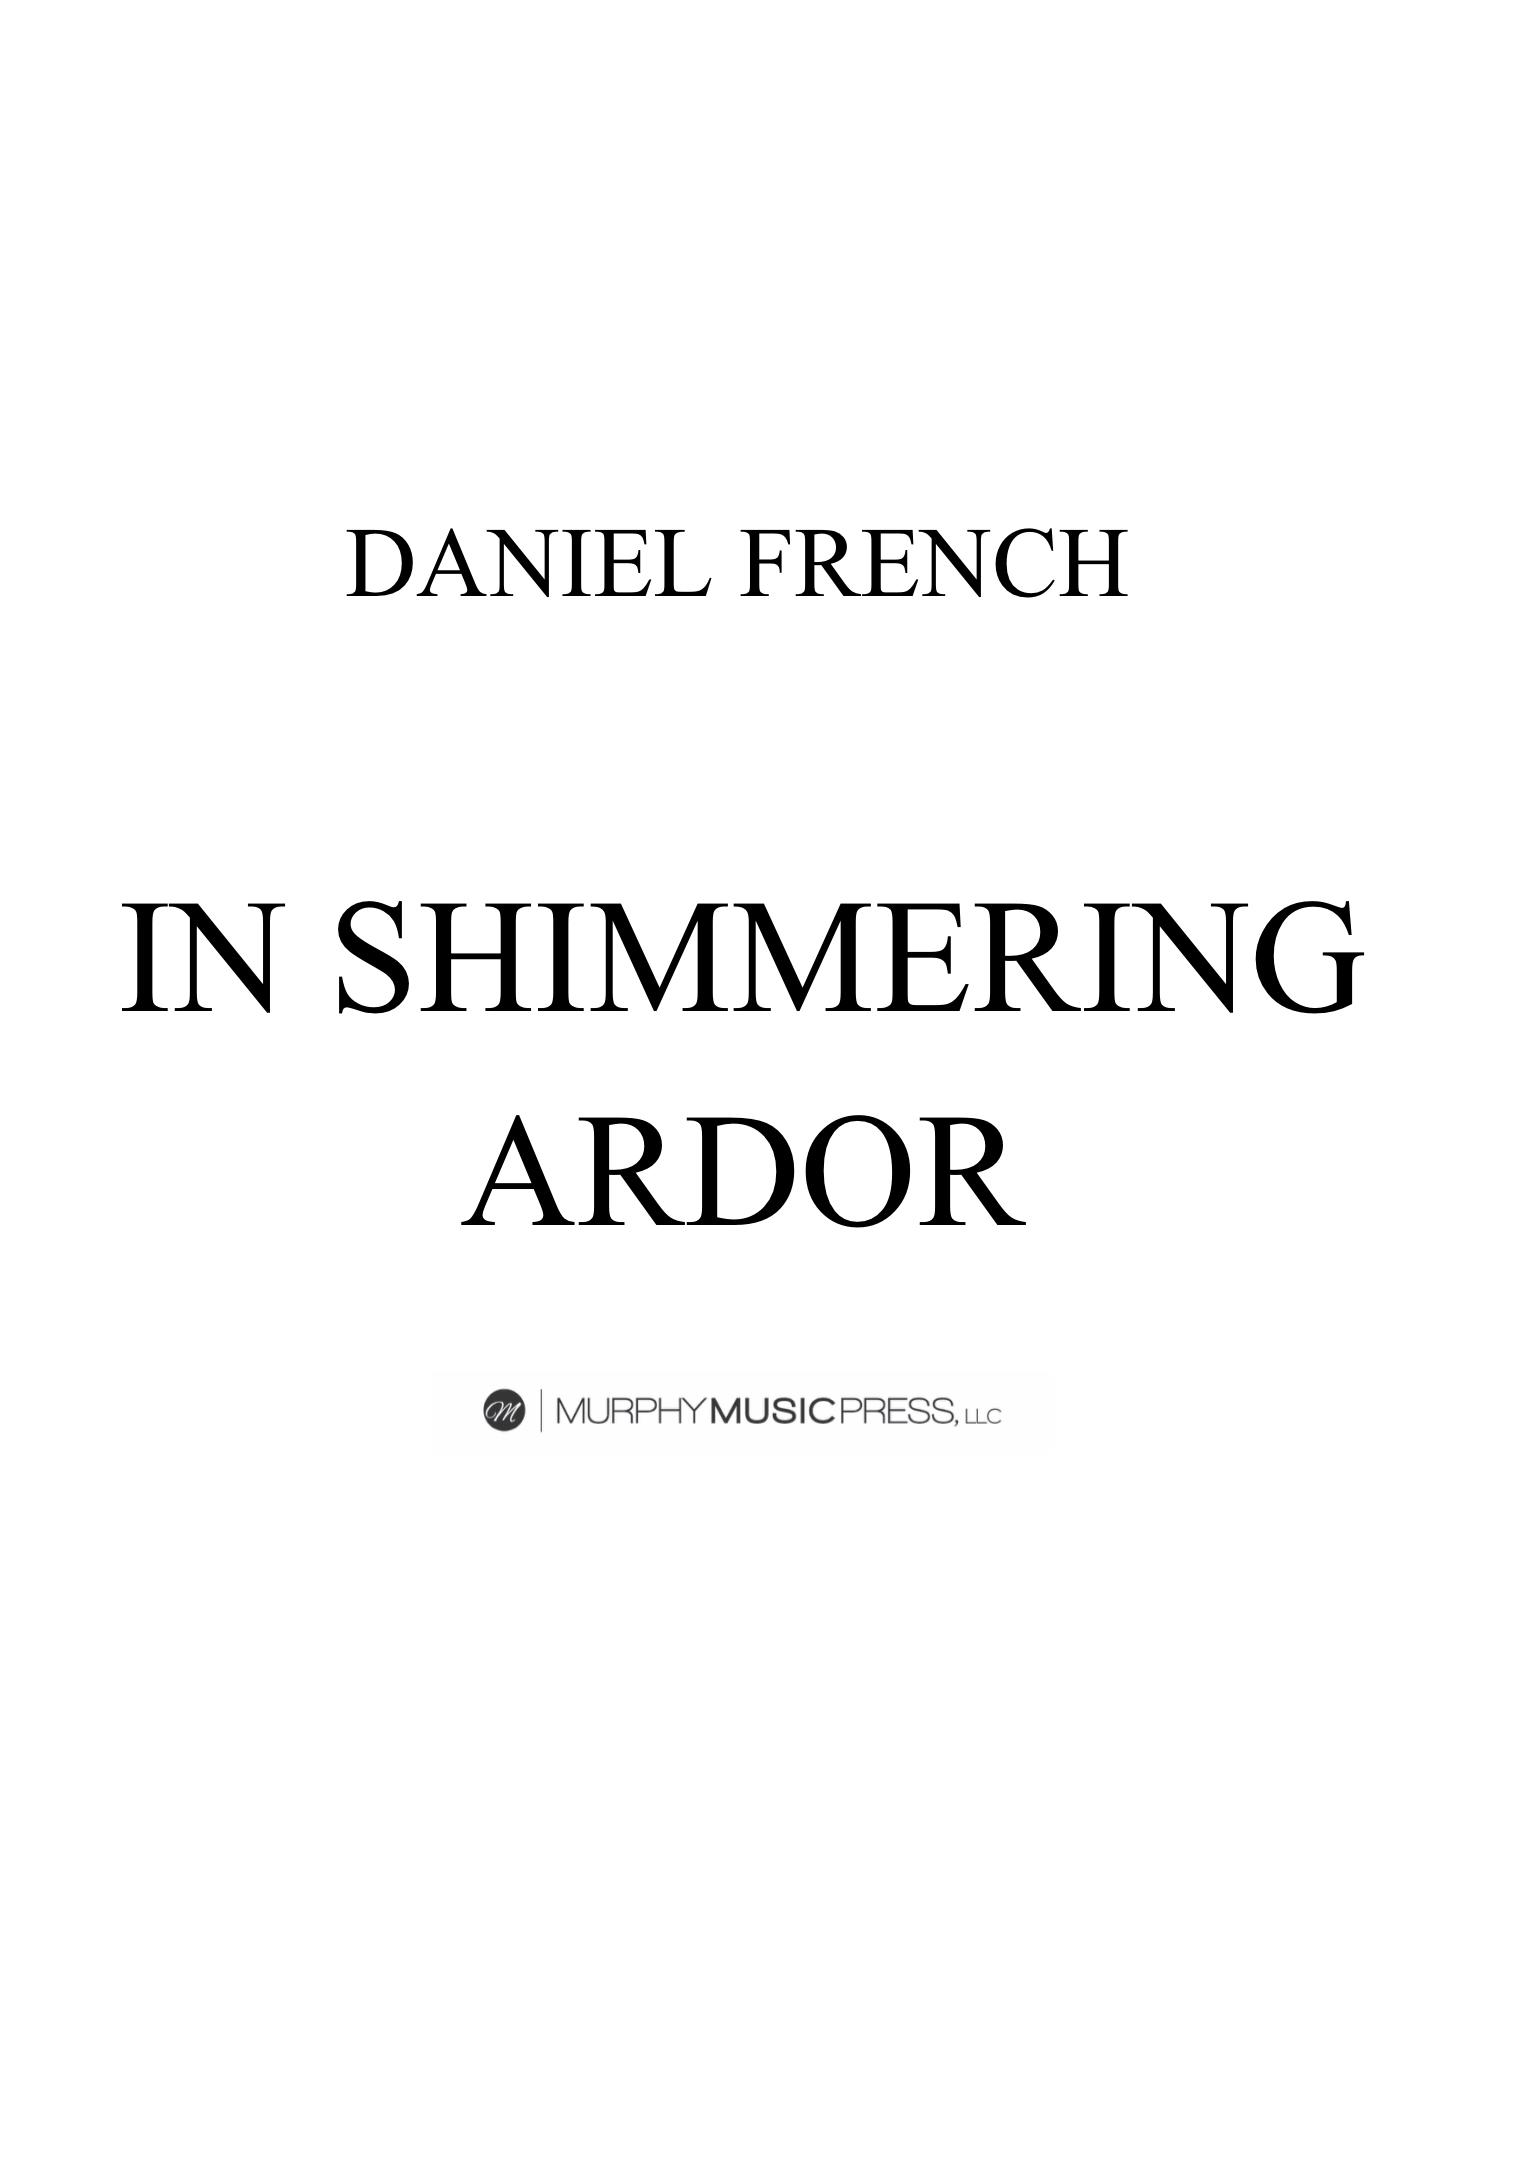 In Shimmering Ardor by Daniel French